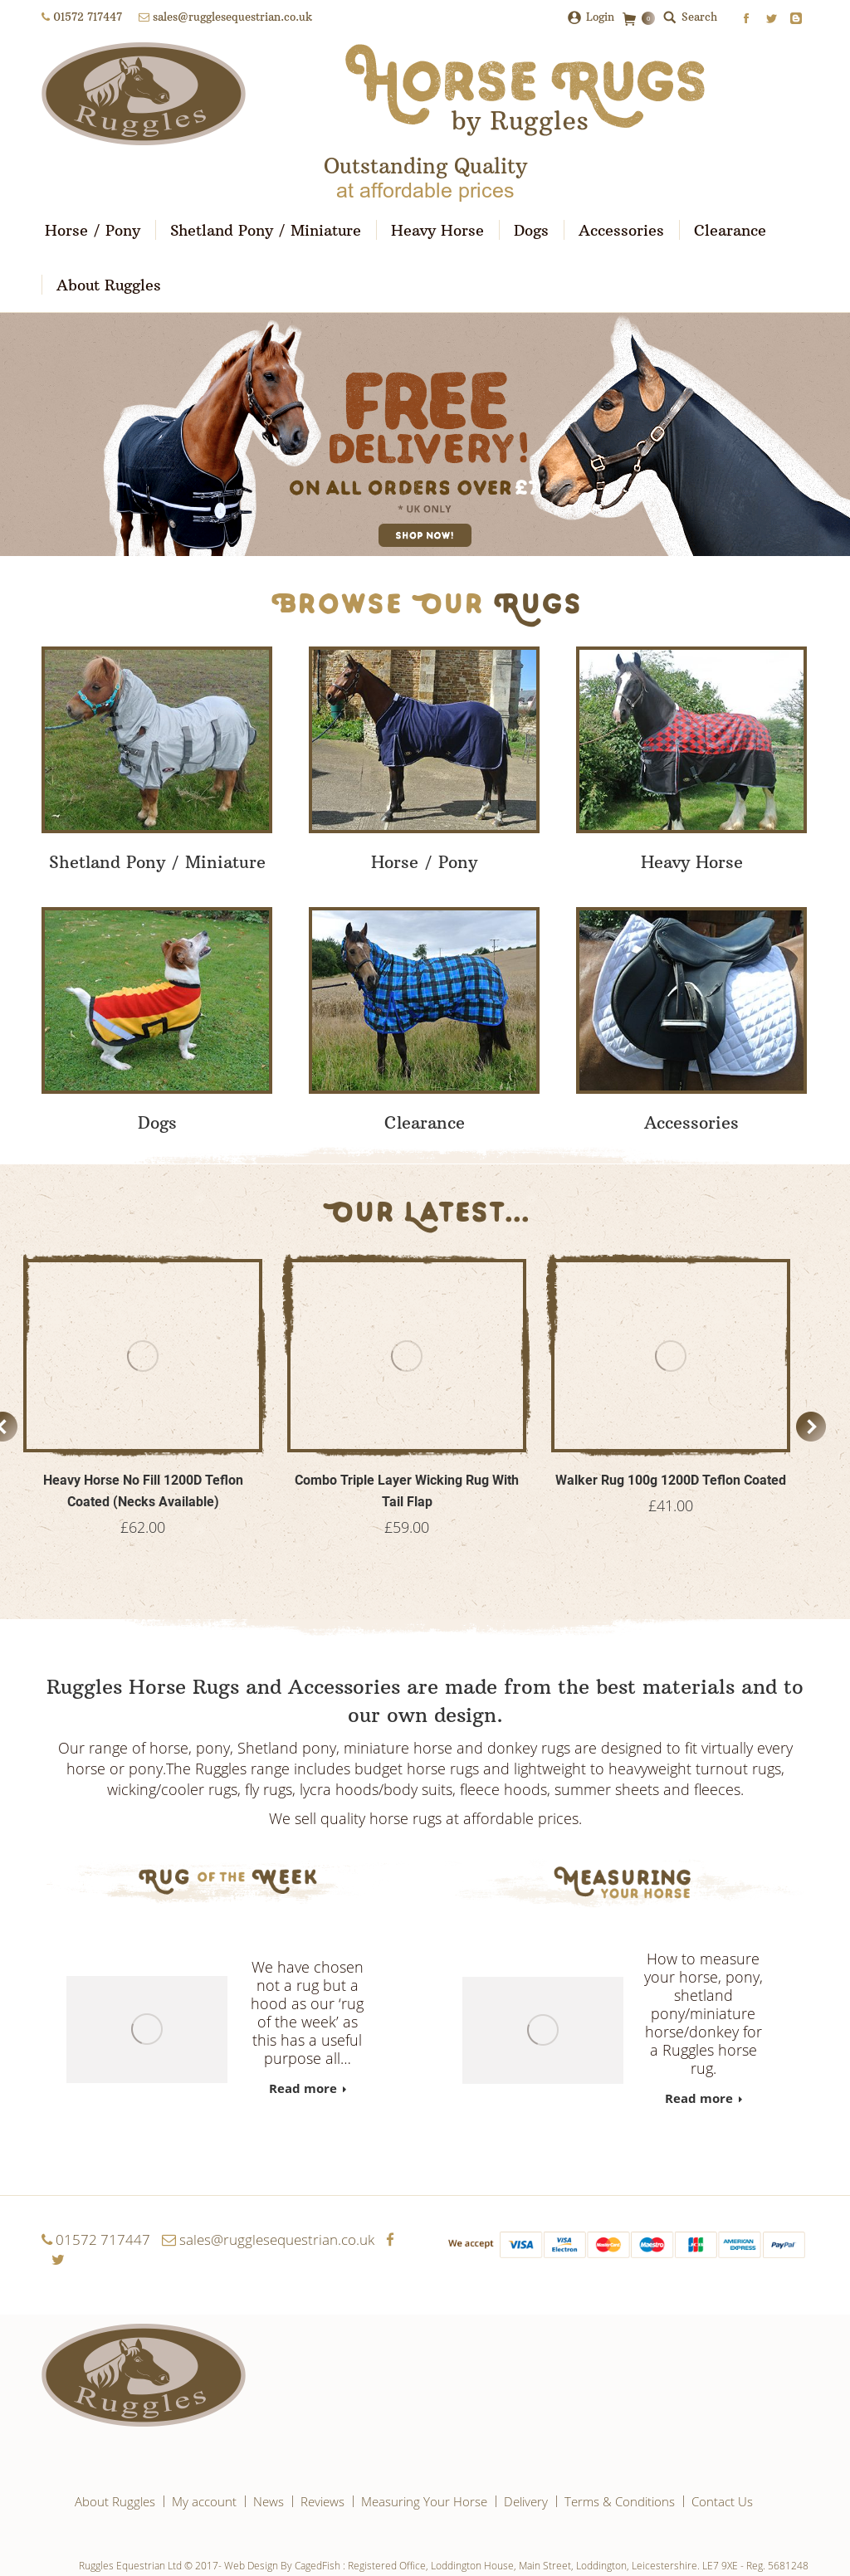 Ruggles Equestrian Compeors Revenue